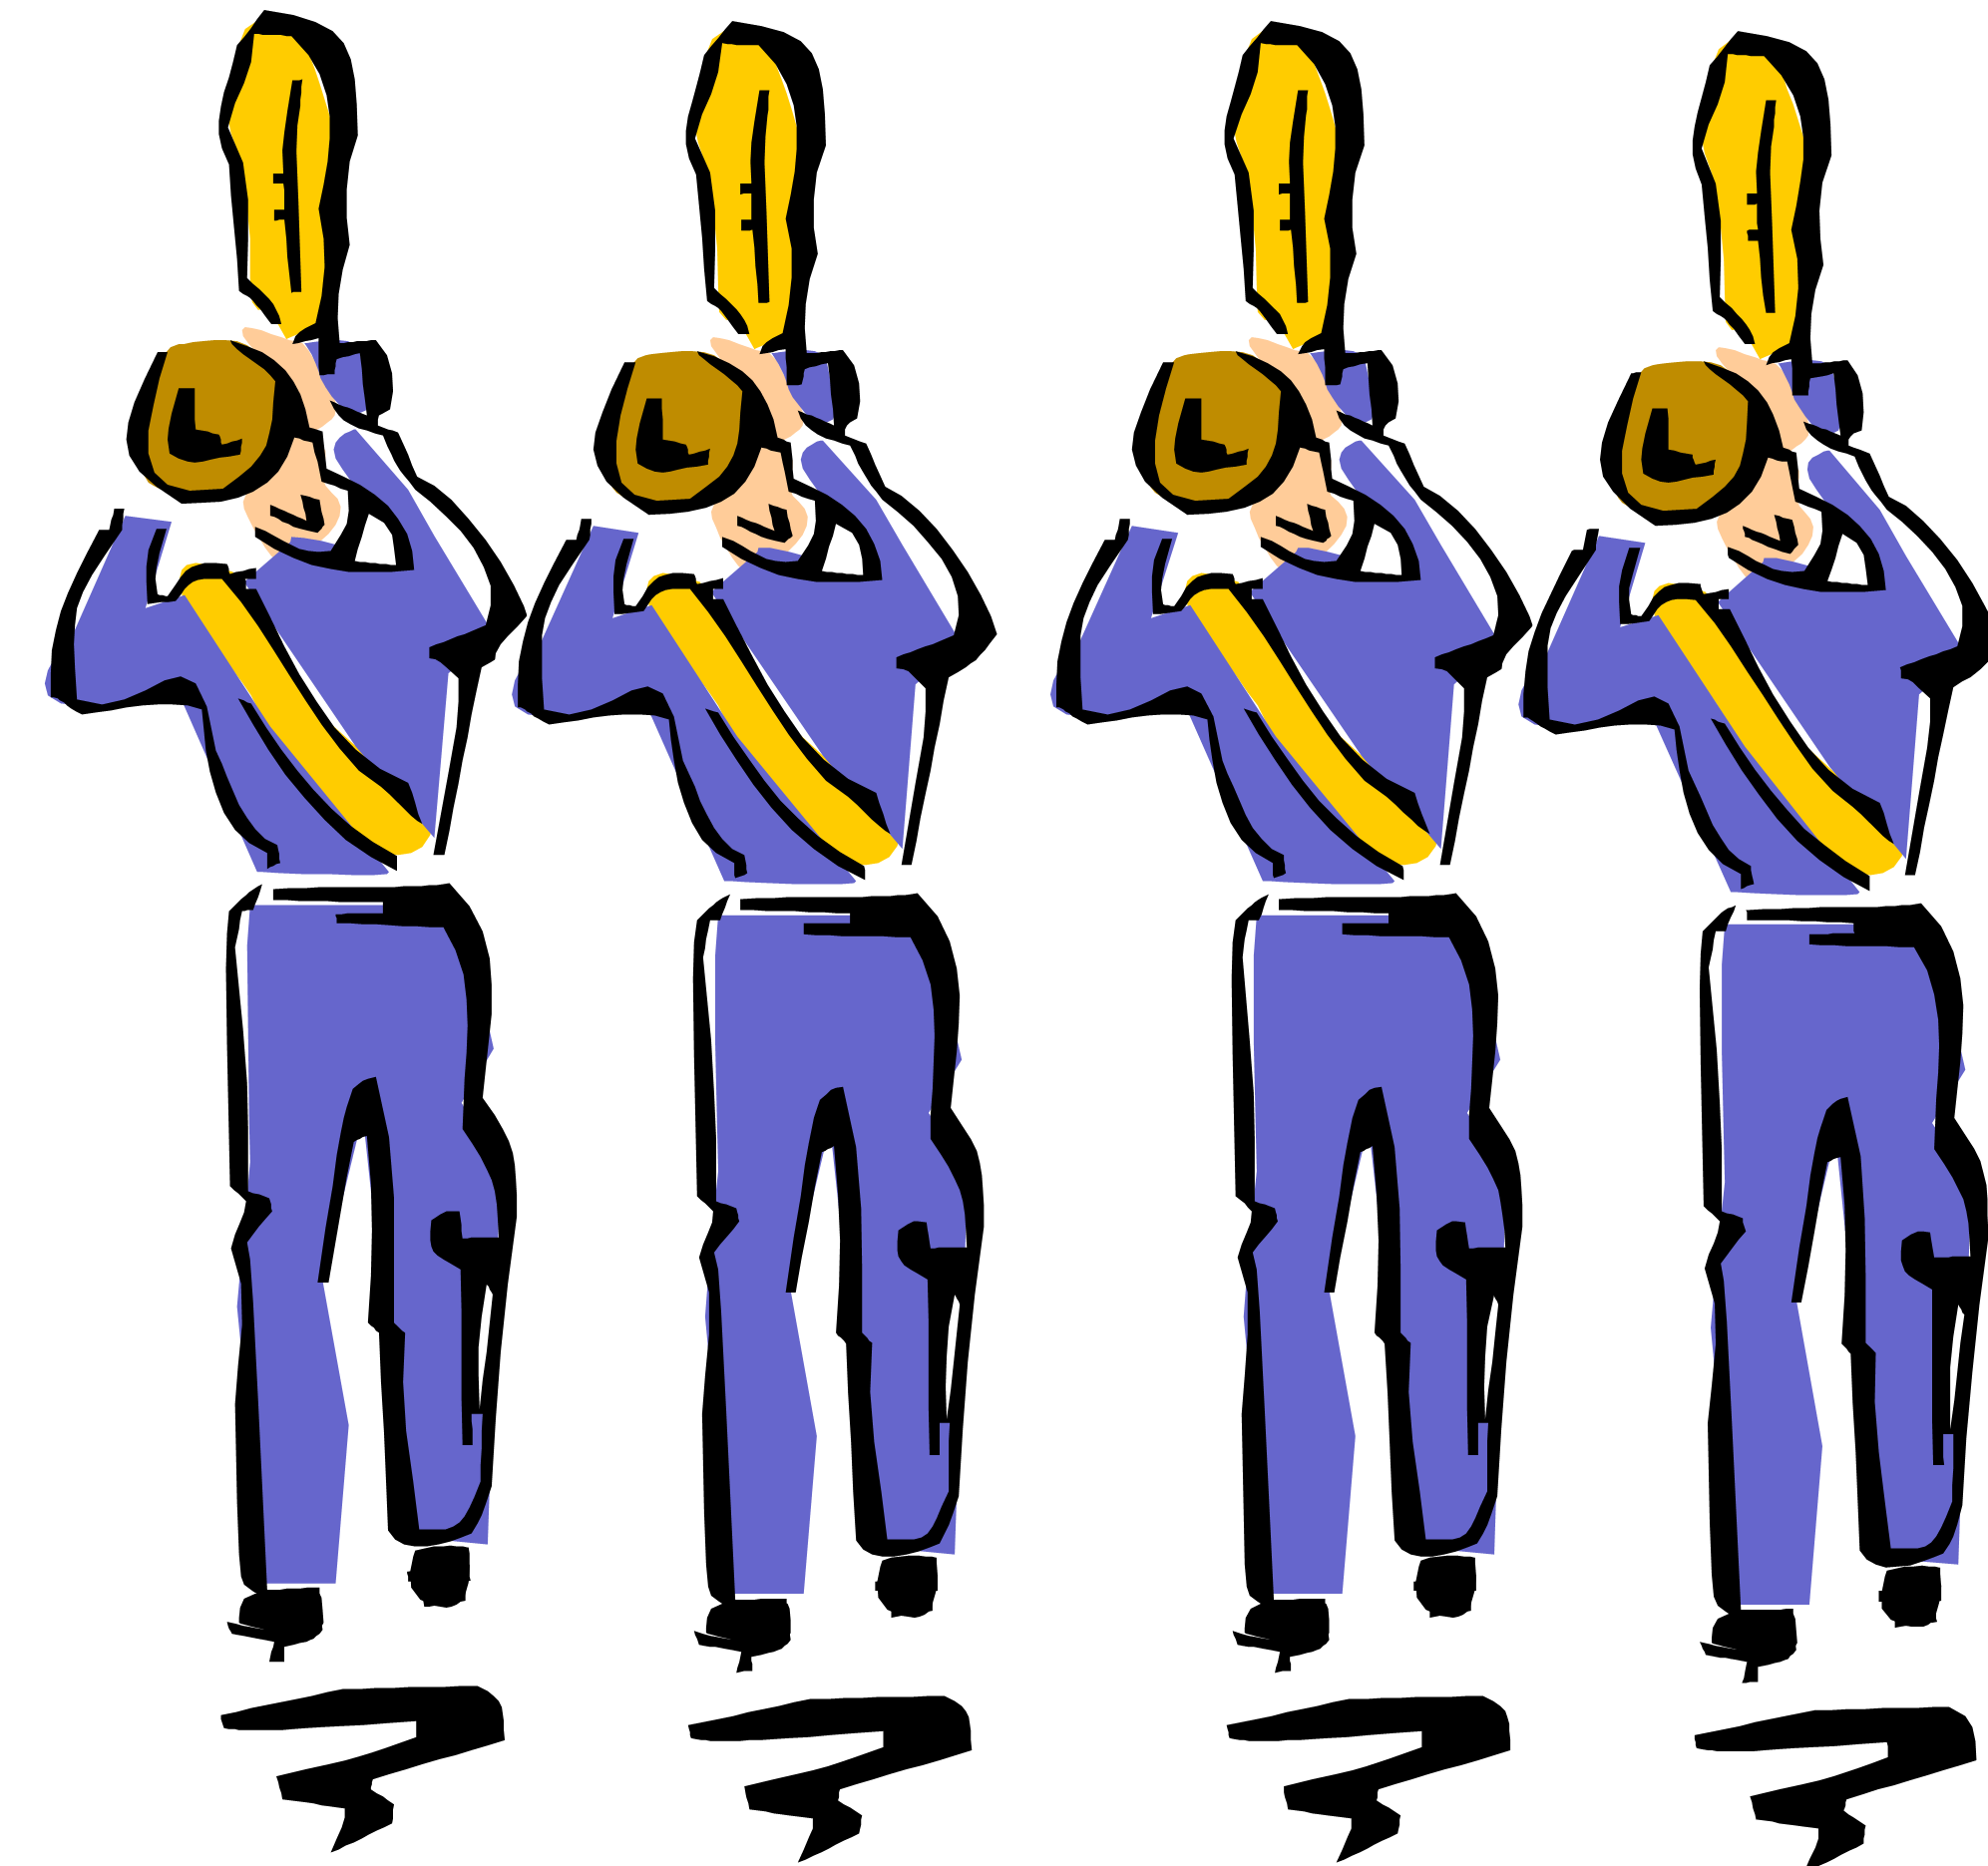 Band clipart marching band. Graphics panda free images